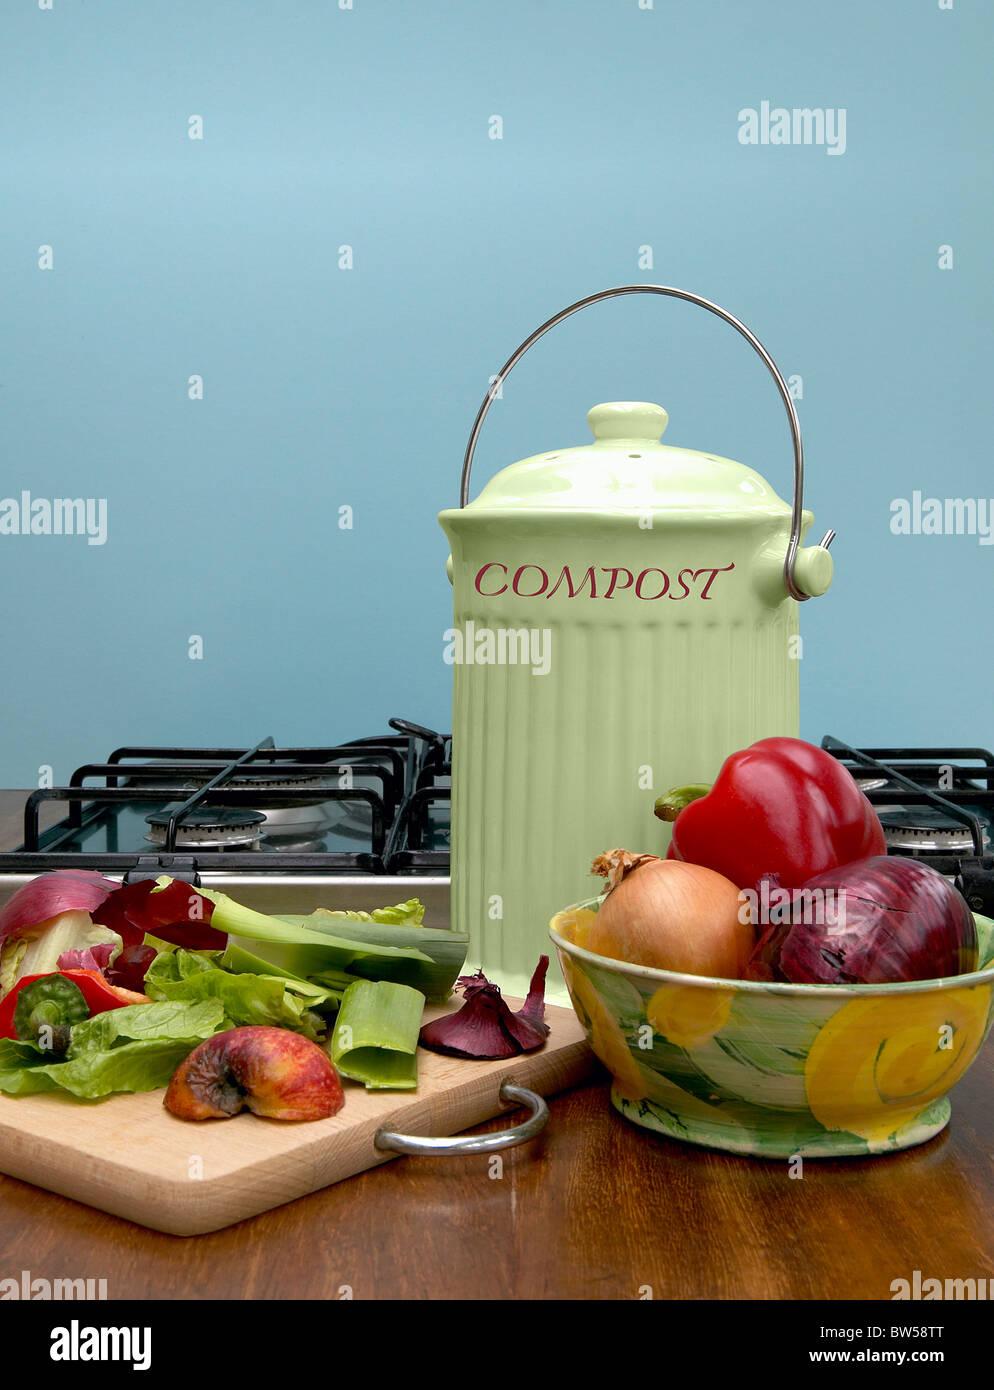 Compost Bin Stock Photos & Compost Bin Stock Images - Alamy